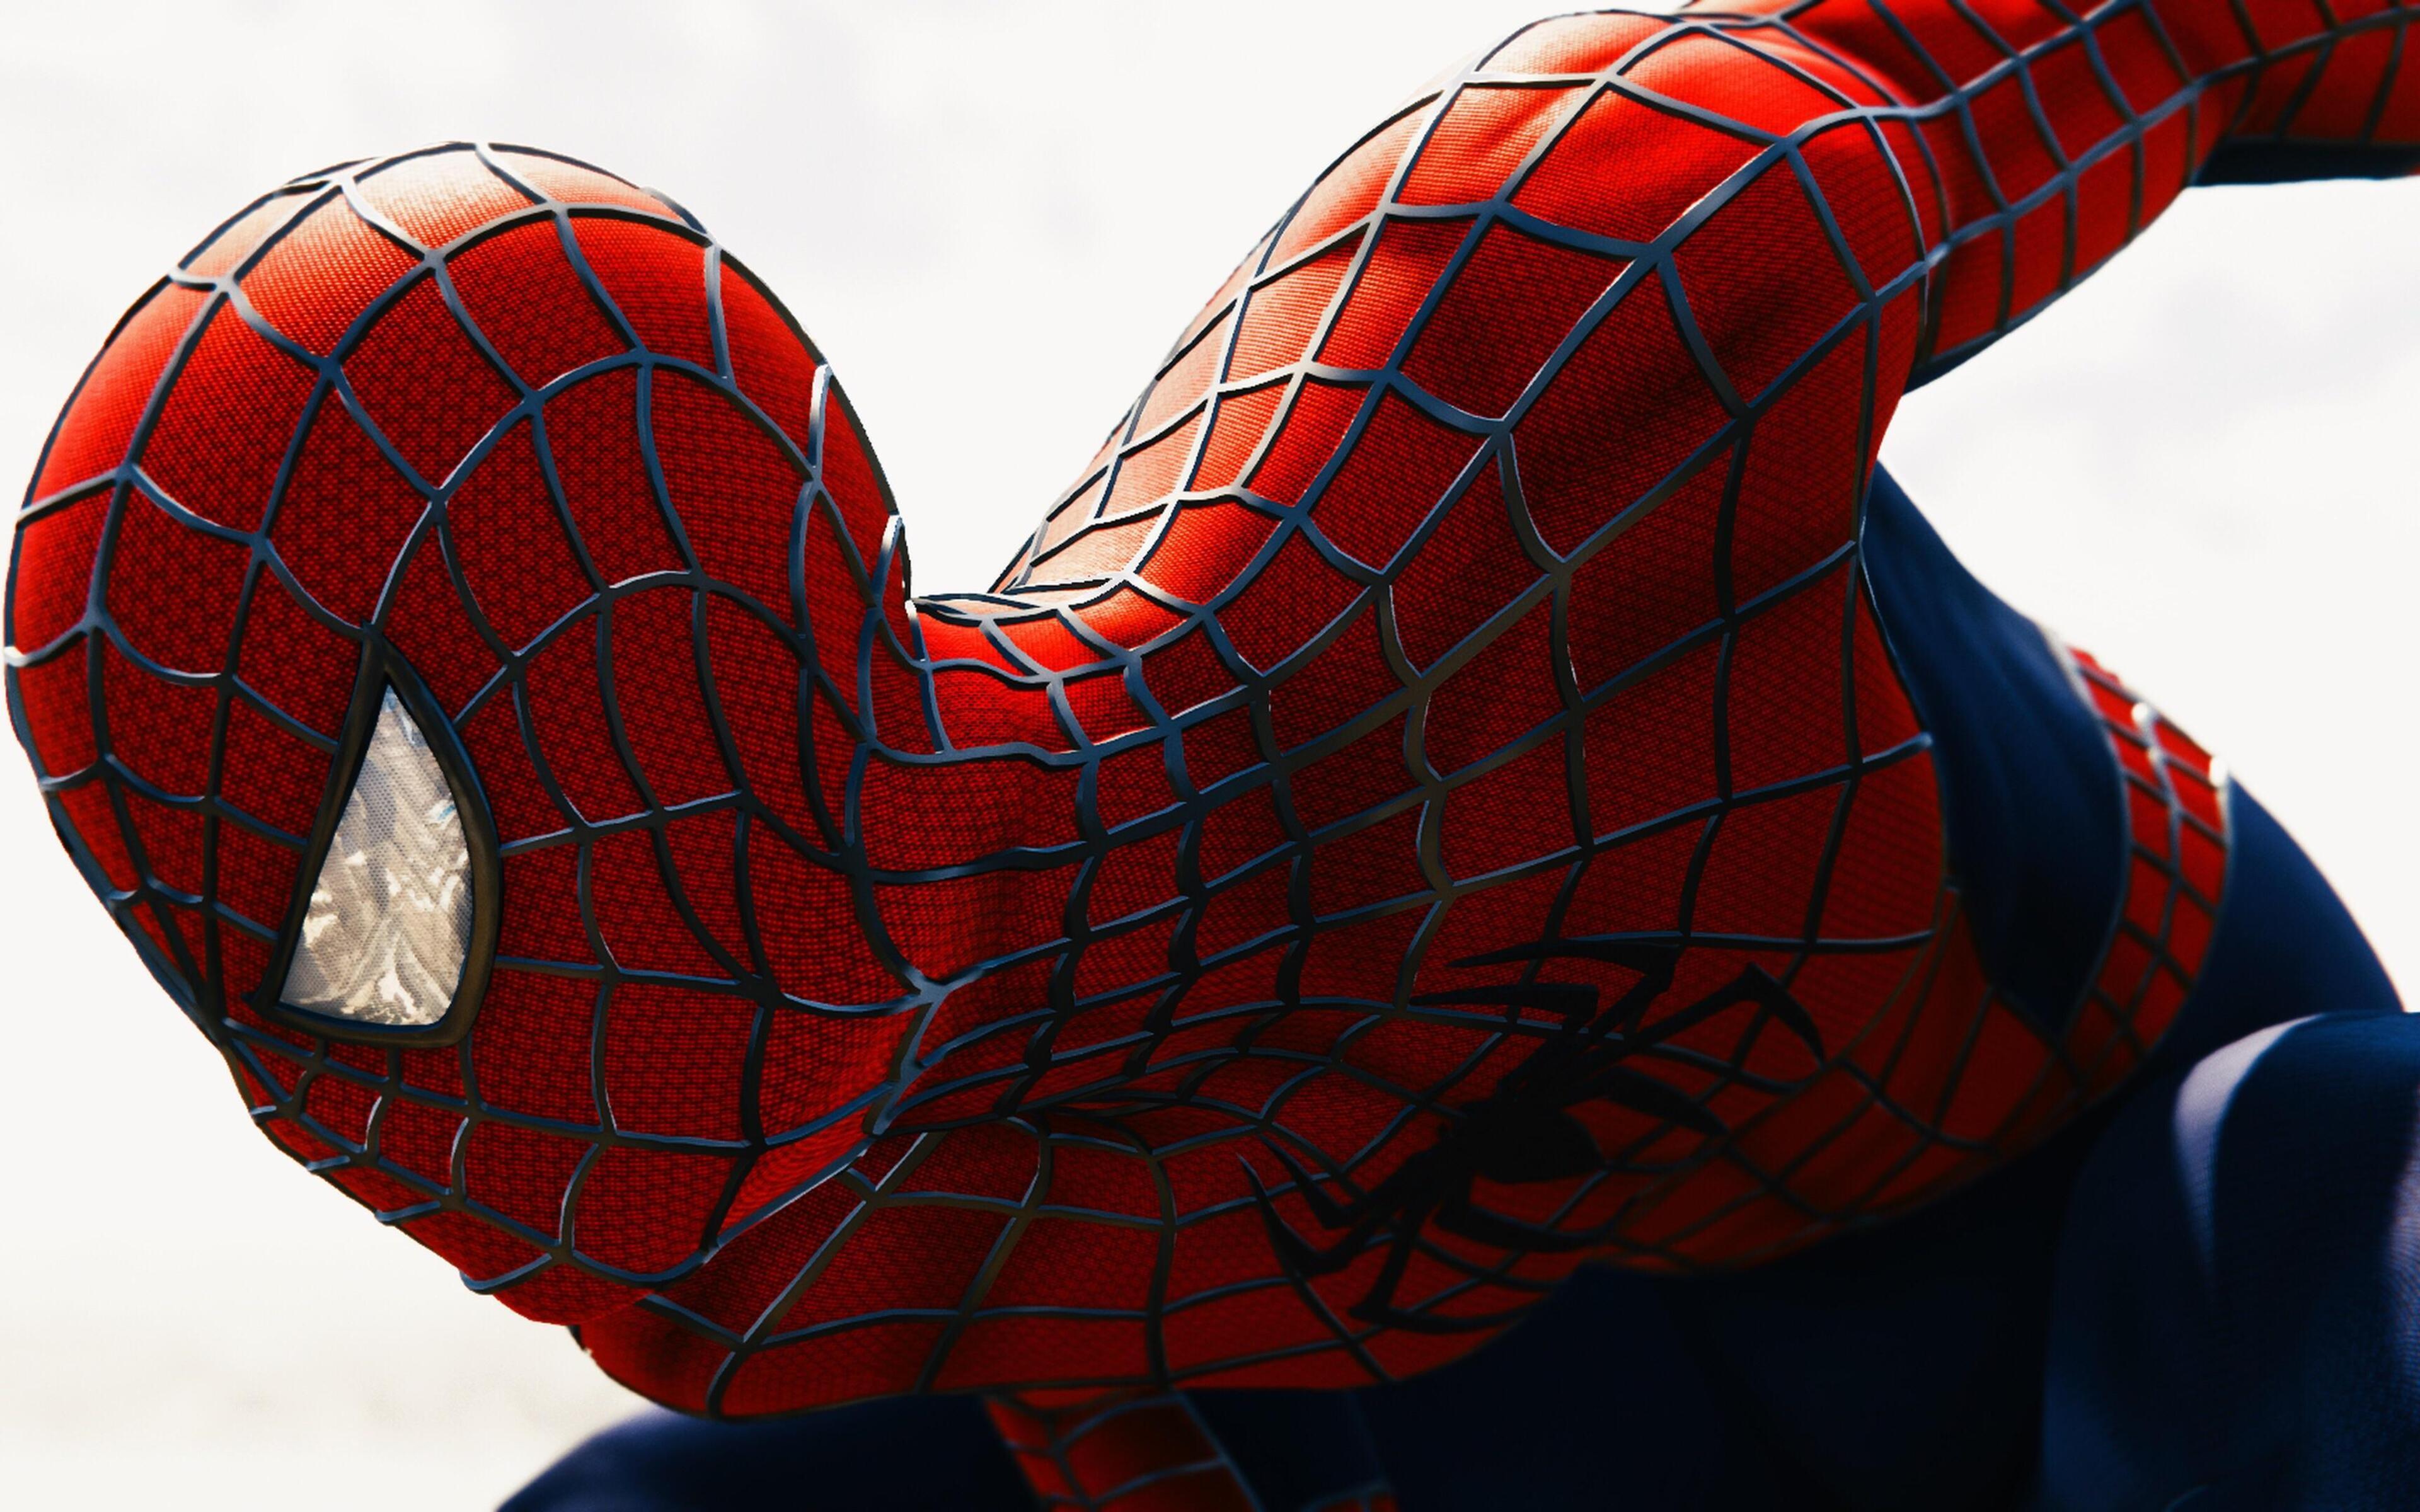 spiderman-ps4-4k-2019-pj.jpg